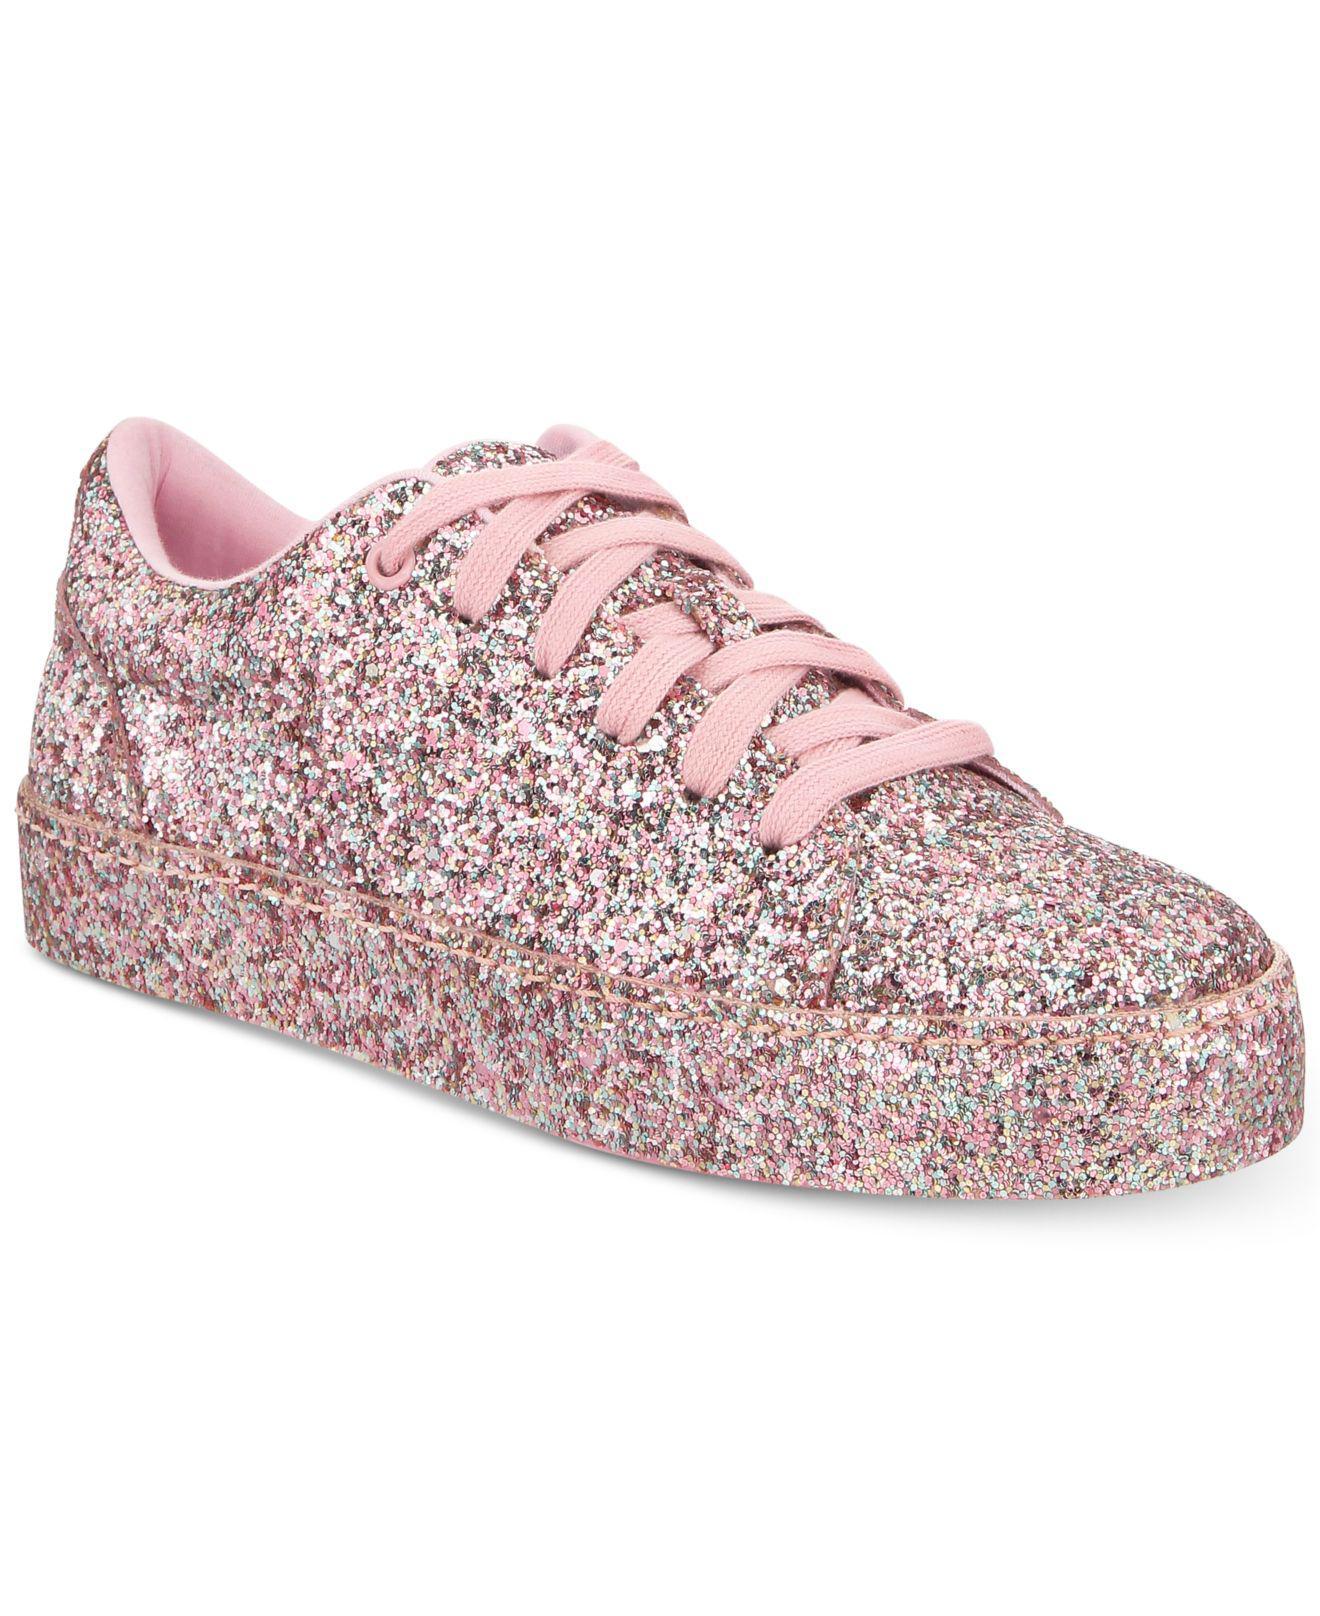 ALDO Etilivia Sneaker in Pink Glitter